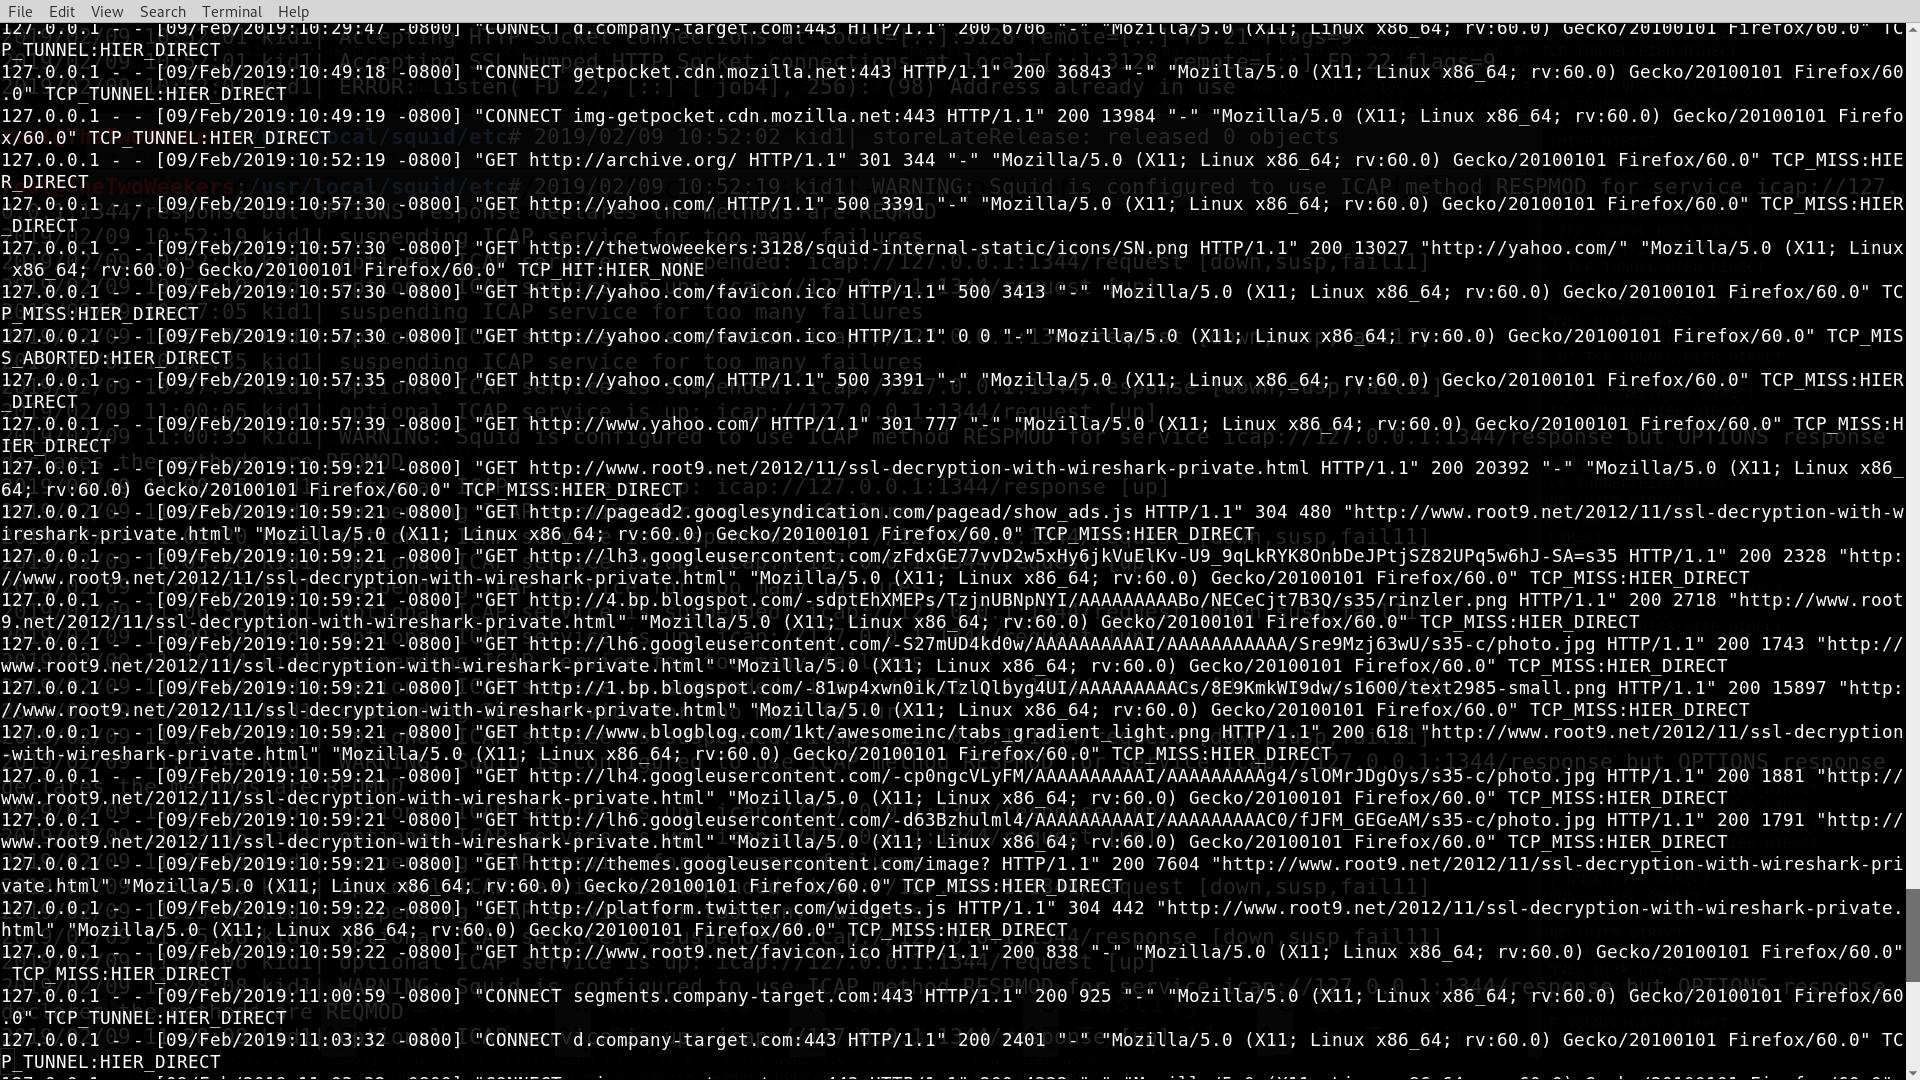 Practical SSL/TLS Attacks and Decrypting Web Traffic - Cybrary